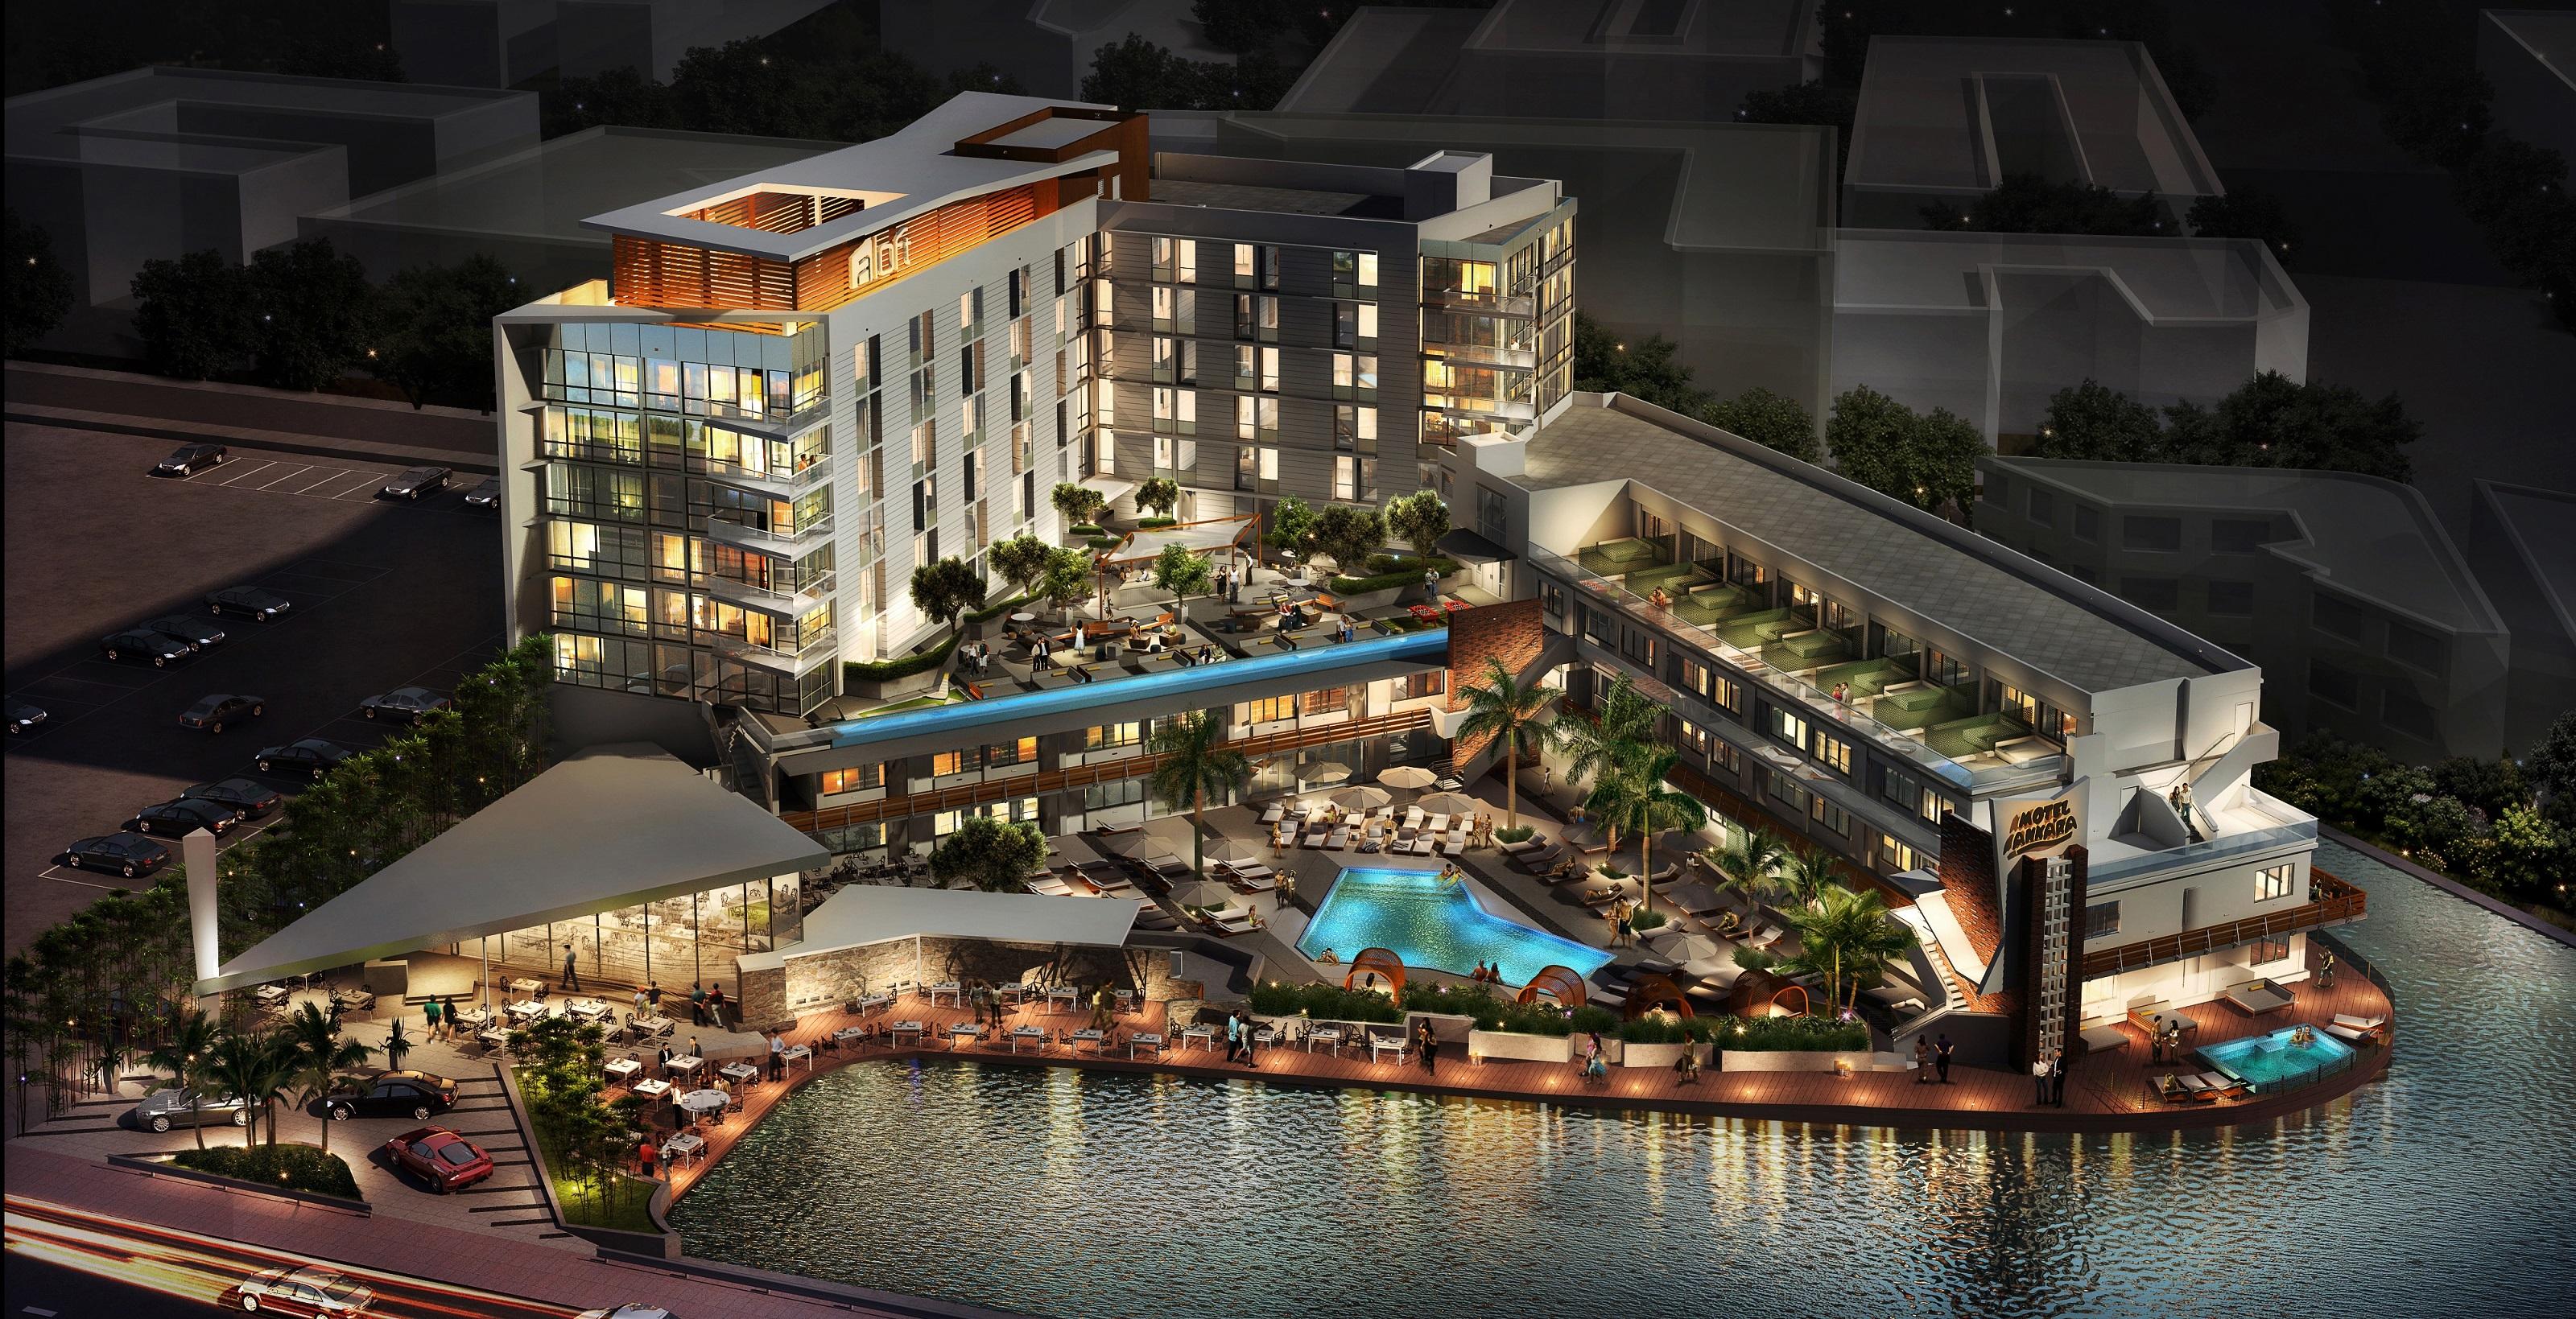 Starwood Aloft Hotel Miami Beach